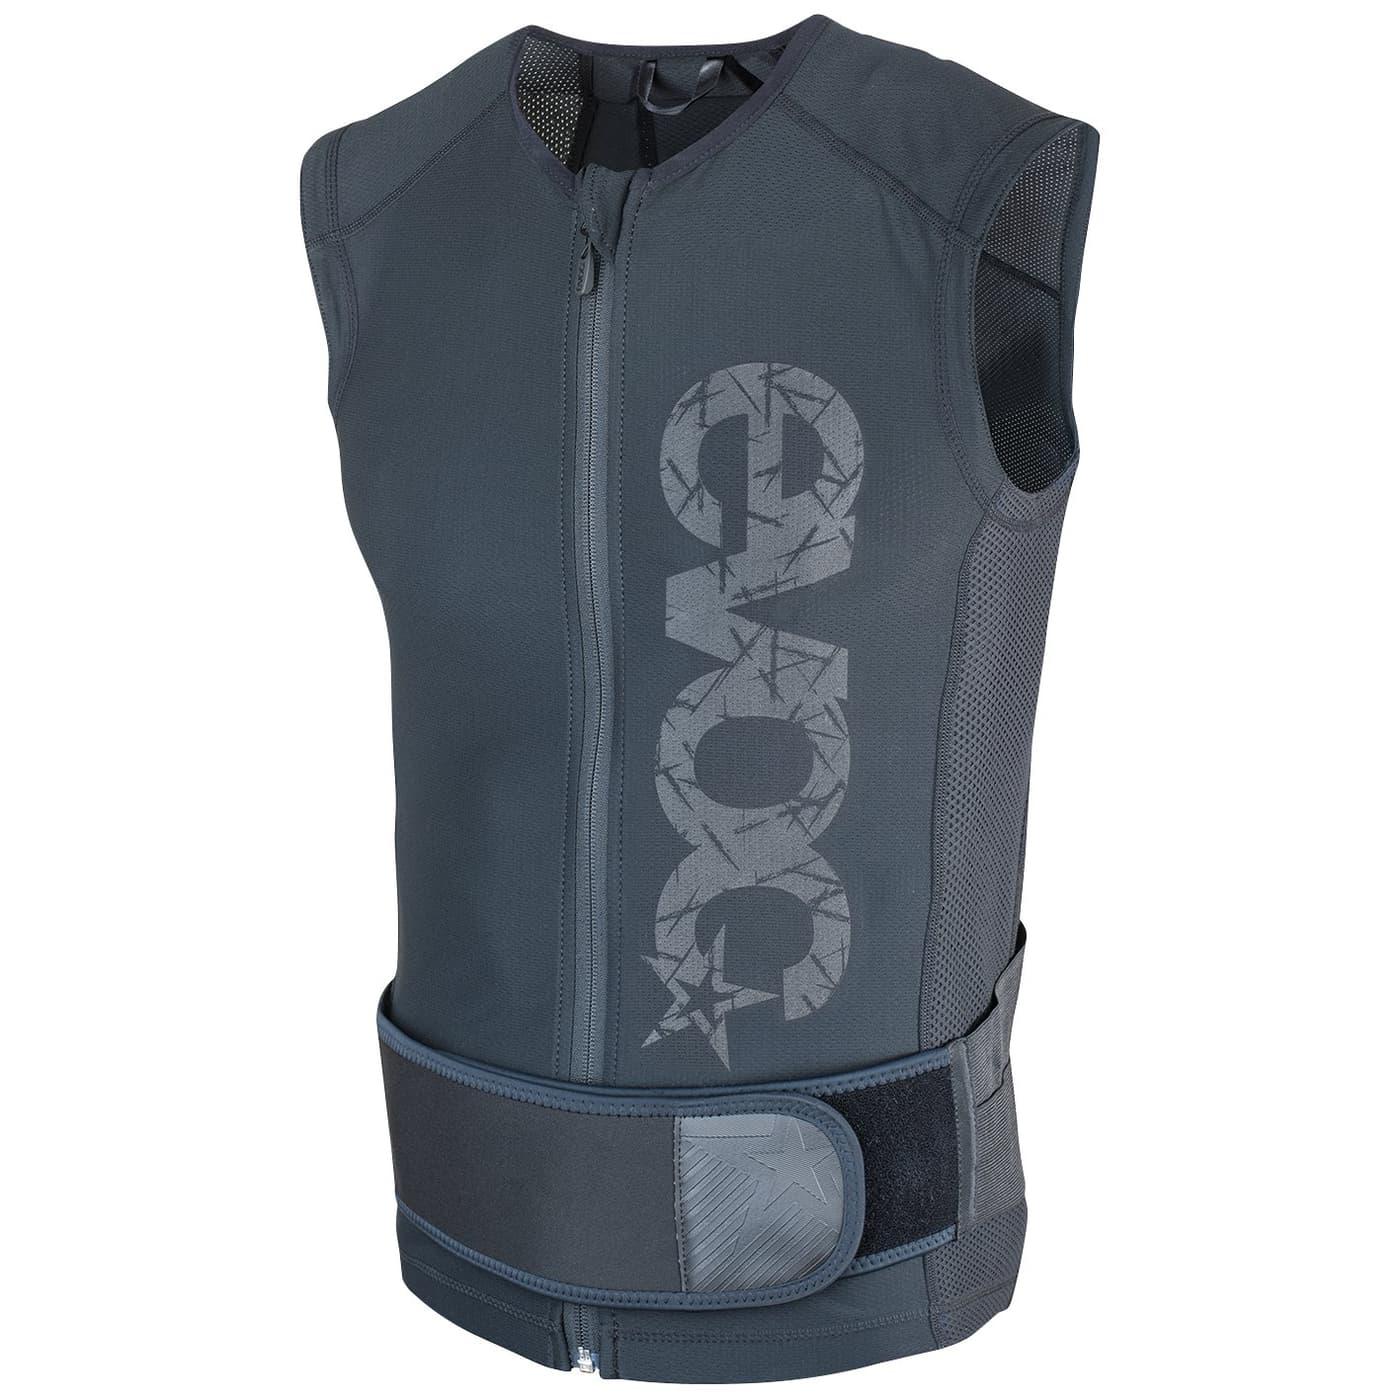 Protection Protection Lite Evoc Dorsale Vest Evoc Dorsale Vest Lite 001rwBEq